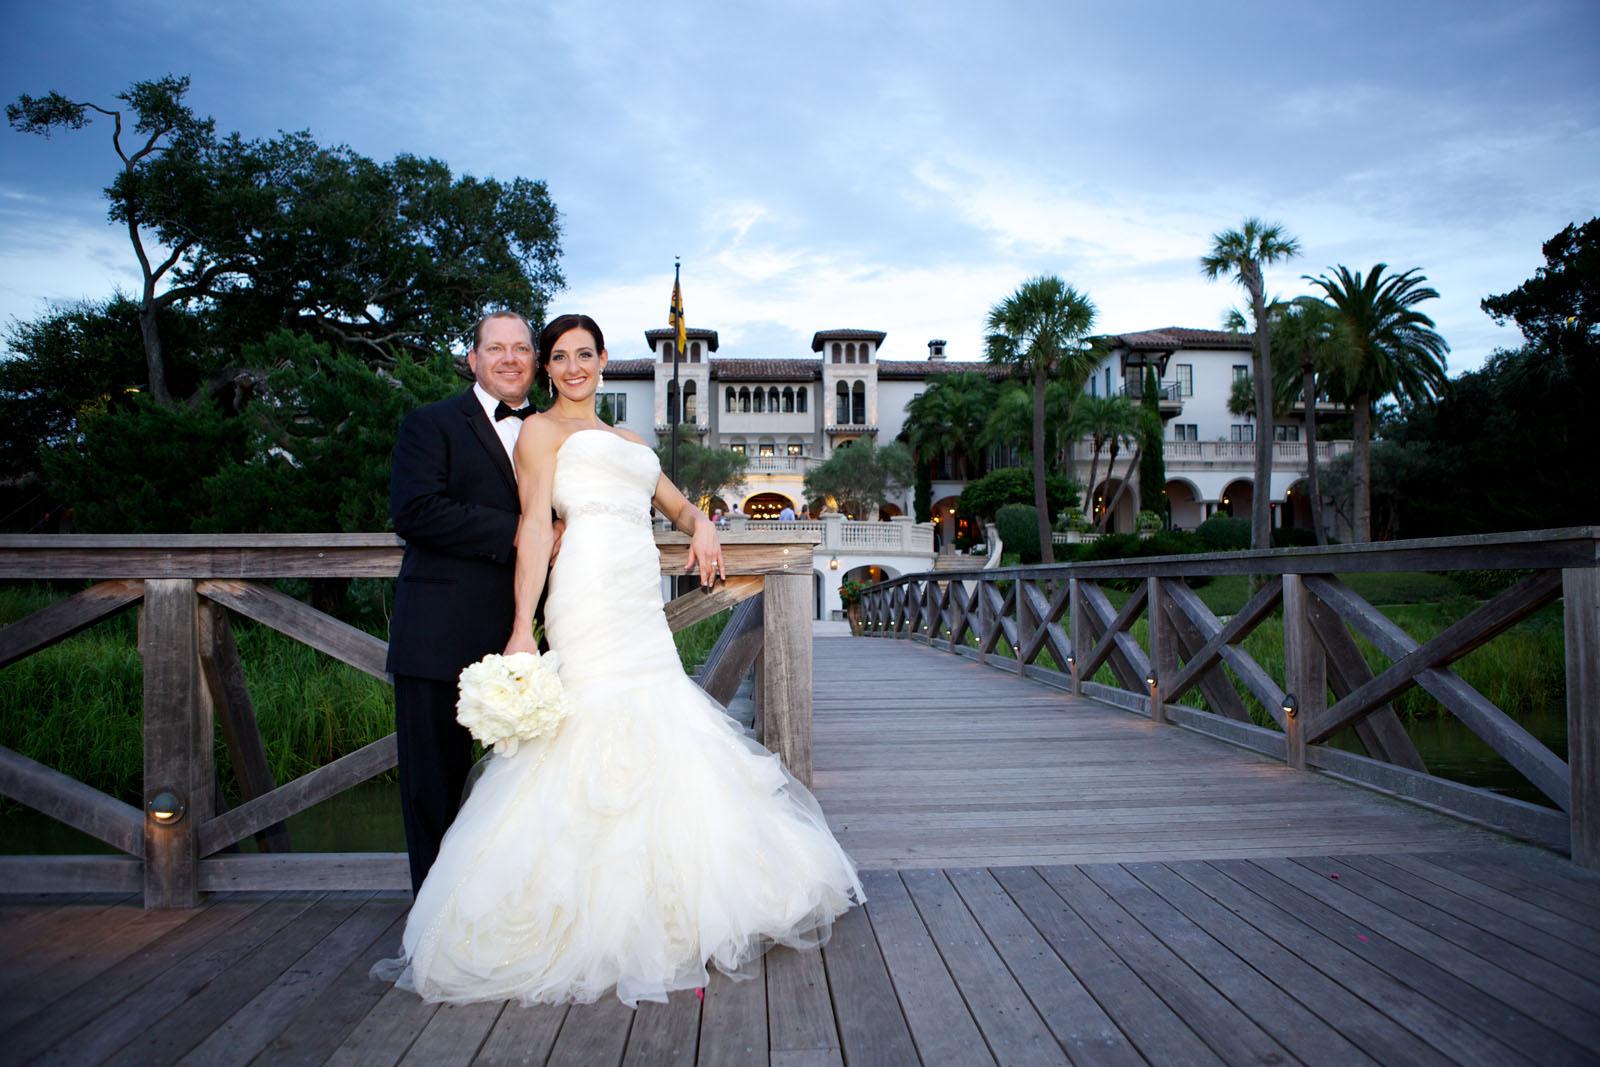 Arden_Photography_Sea_Island_Wedding32.jpg